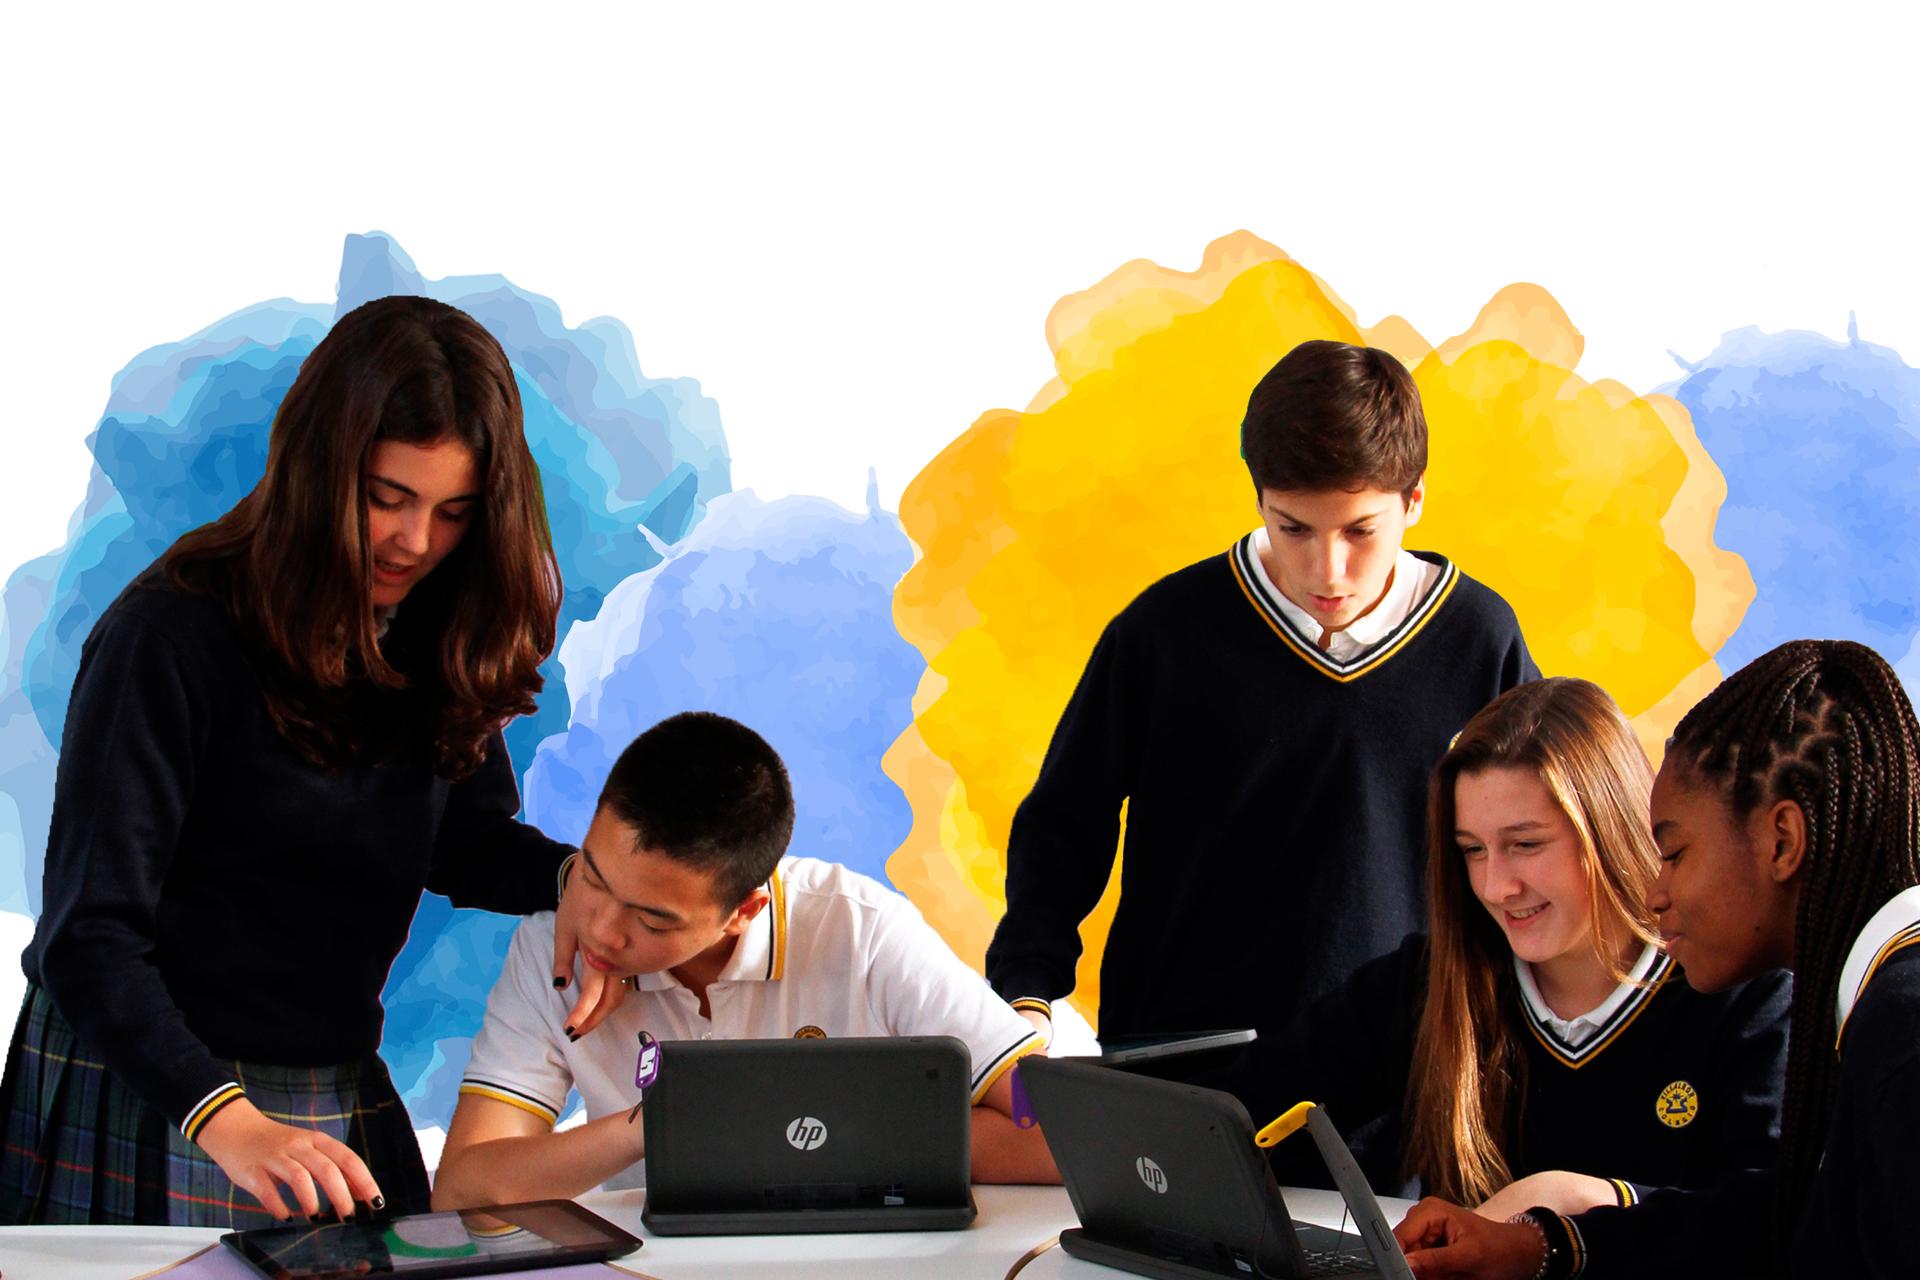 Colegio Villalkor Madrid Tablets Tecnologia